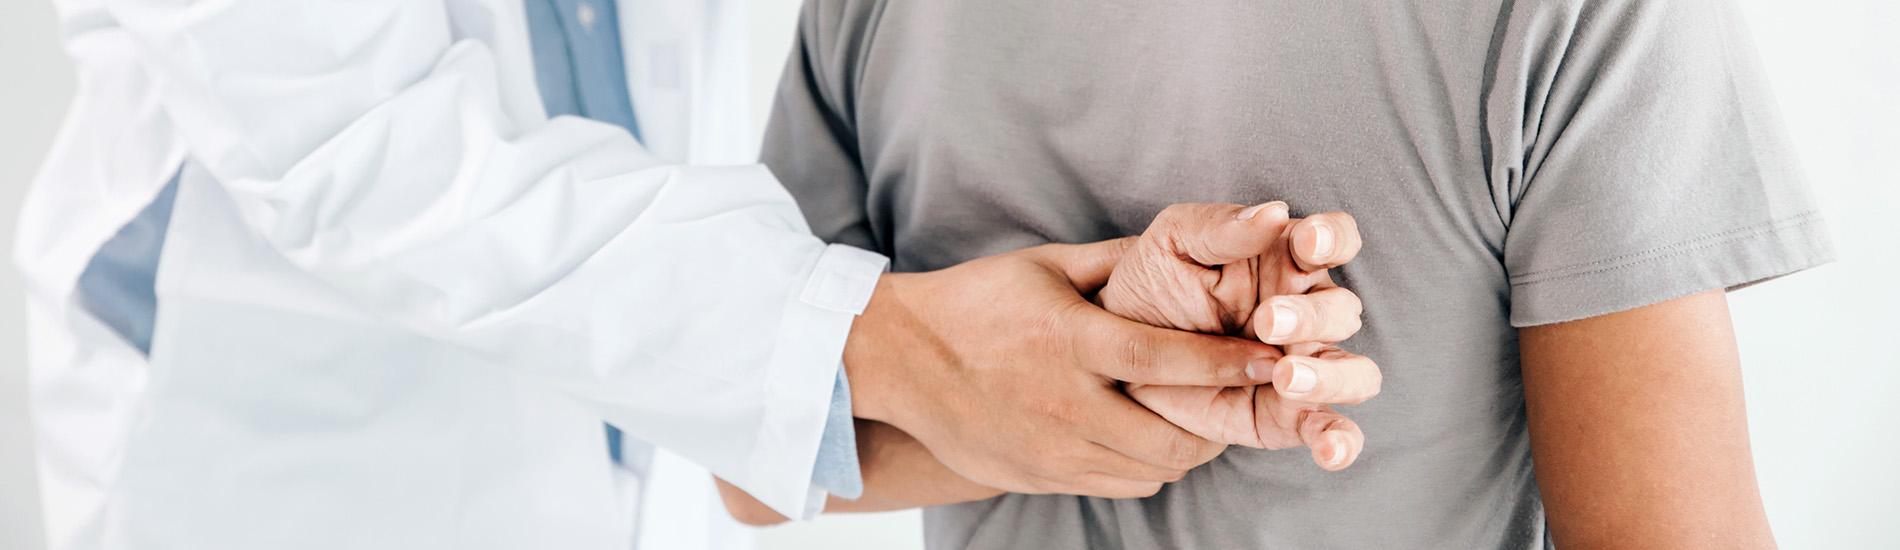 Ostéopathe à Clermont-Ferrand